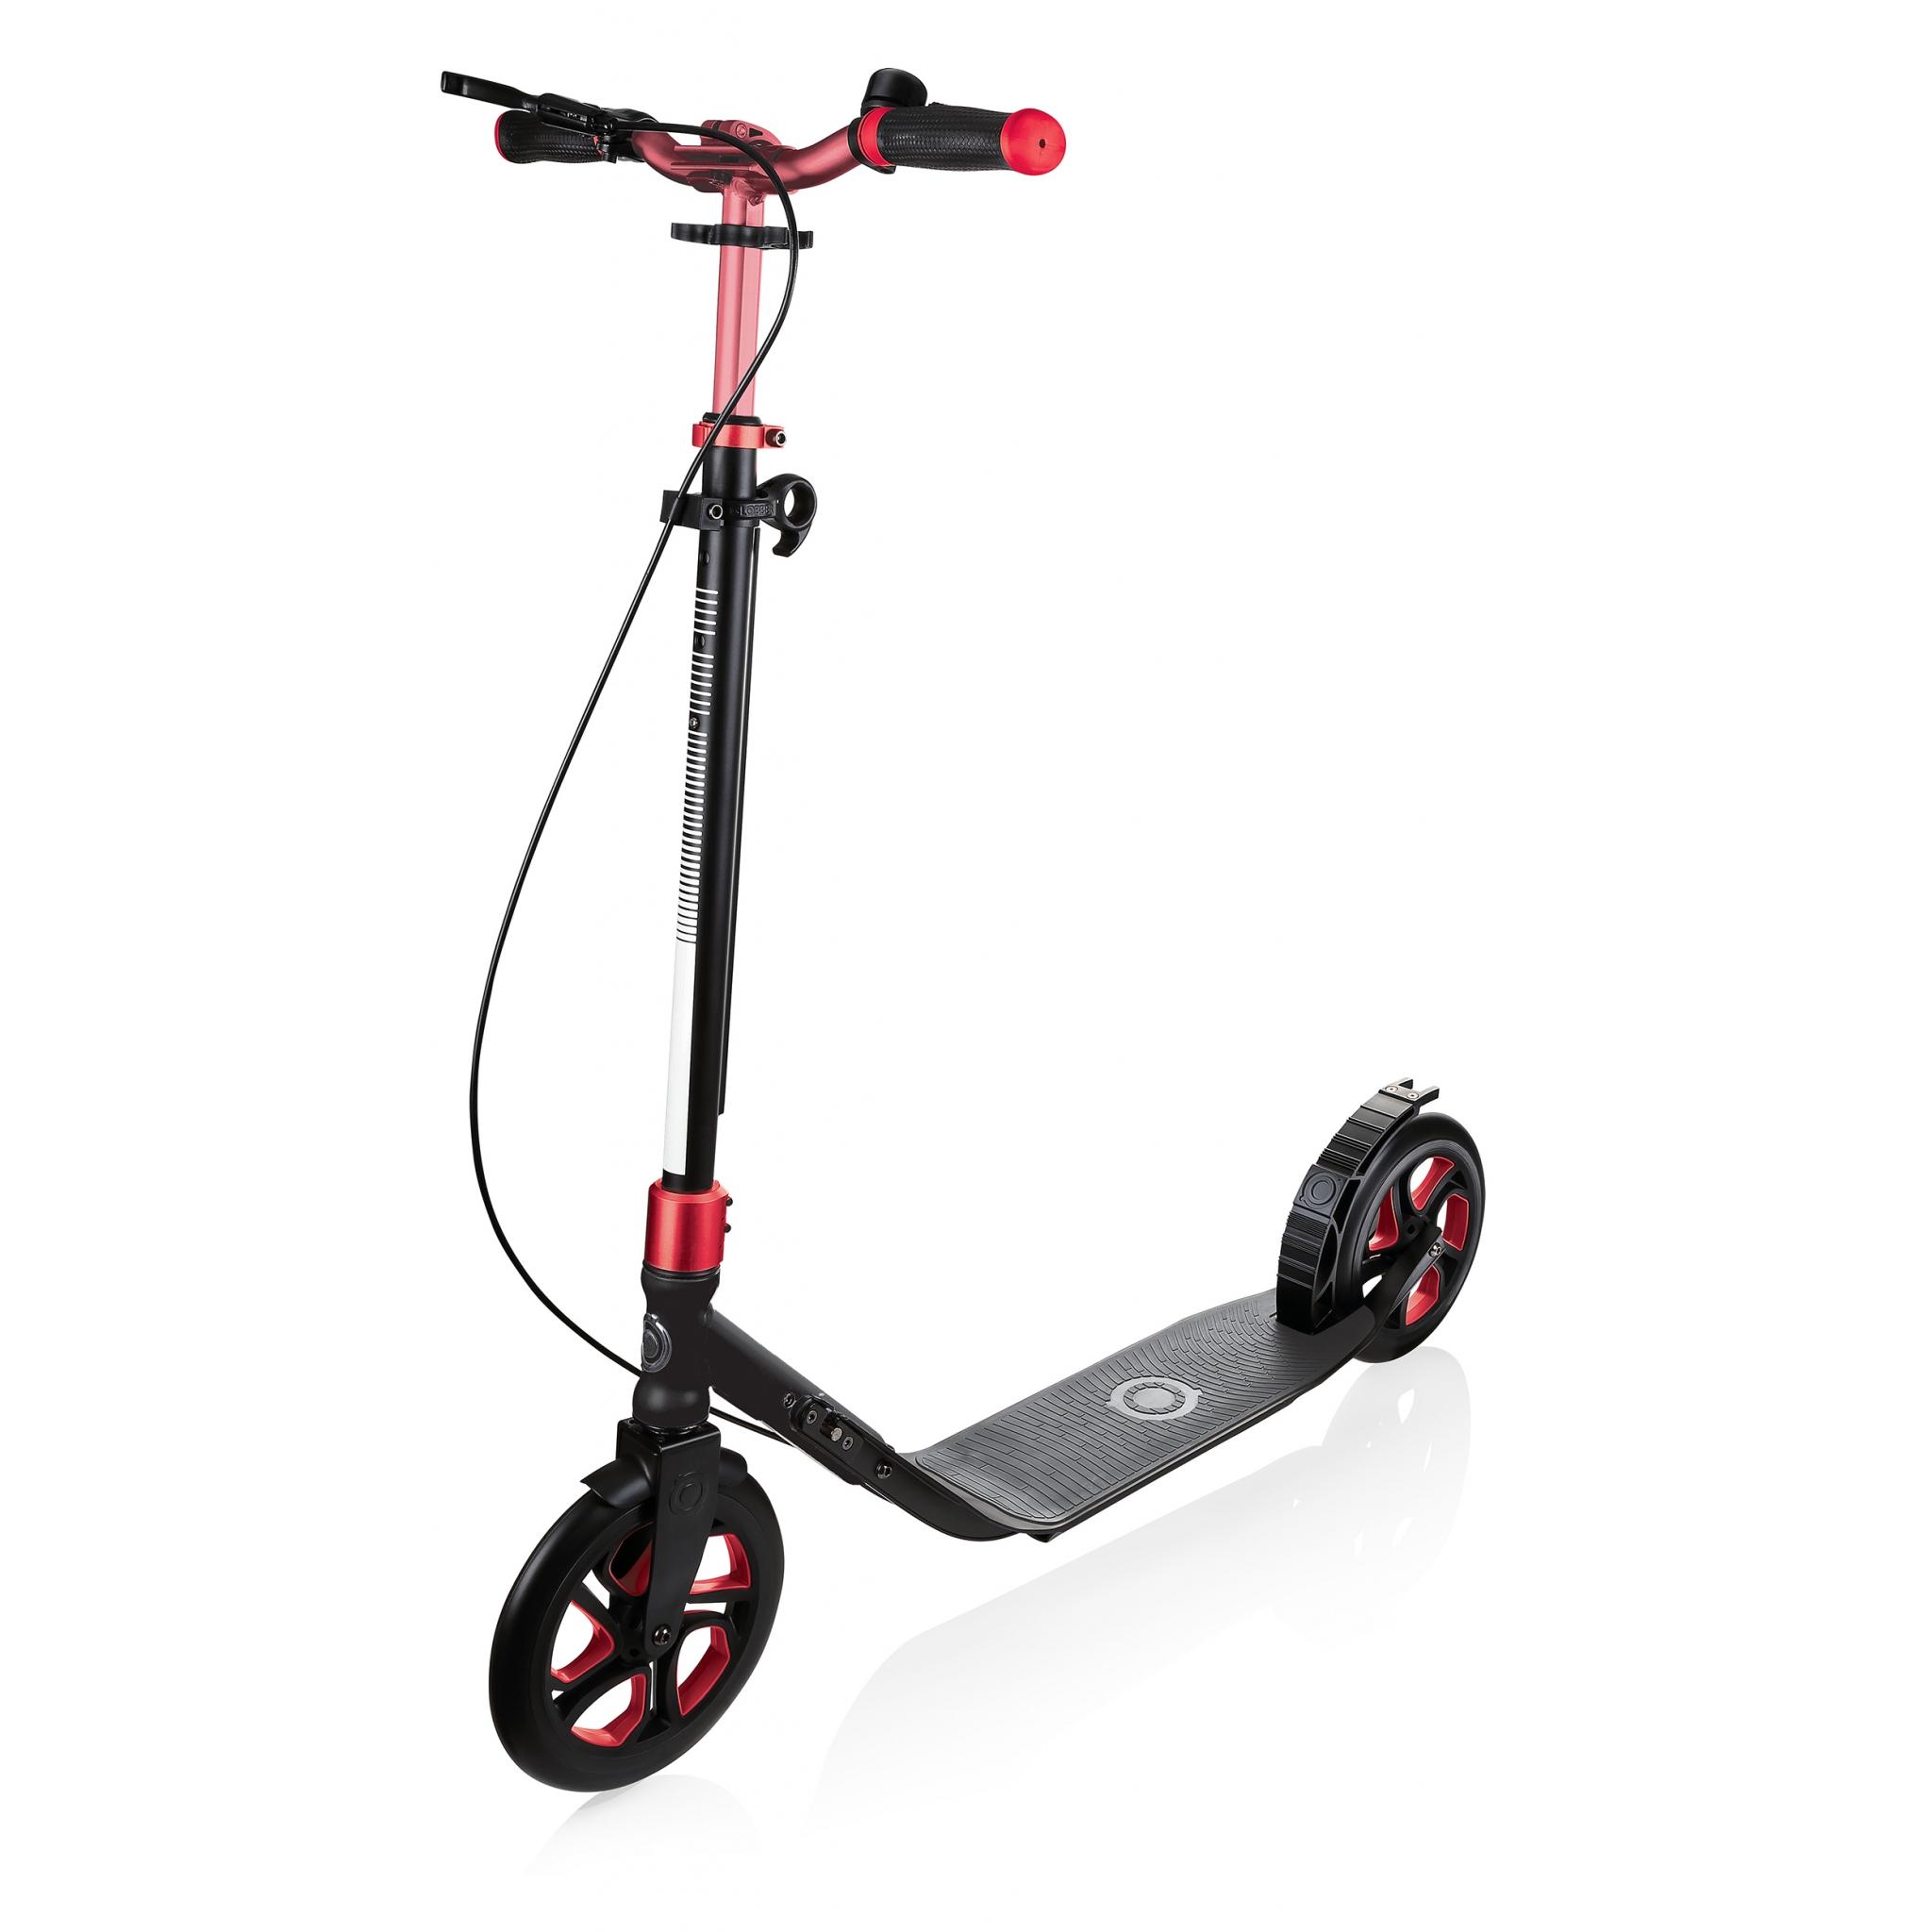 big wheel kick scooter - Globber ONE NL 230 ULTIMATE